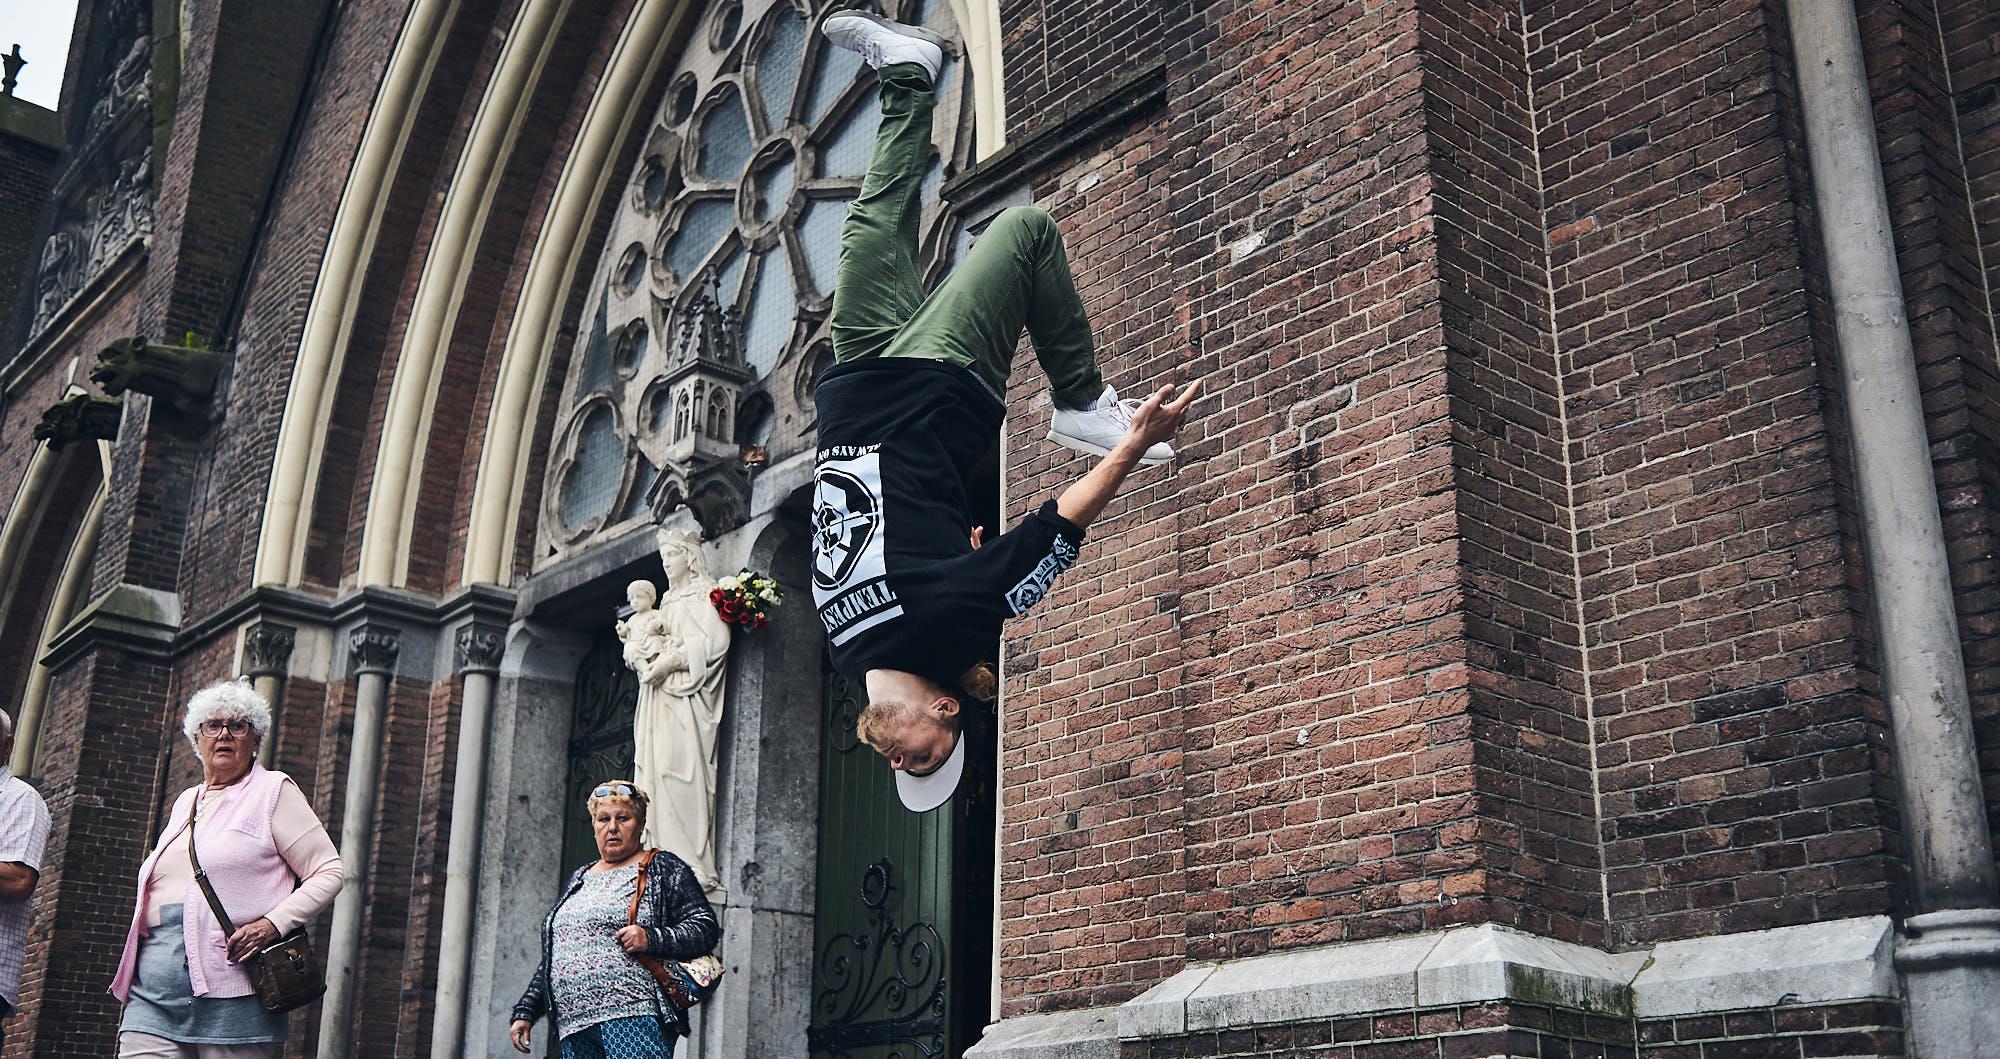 Bart van der Linden performing a freerunning trick on a church in Eindhoven